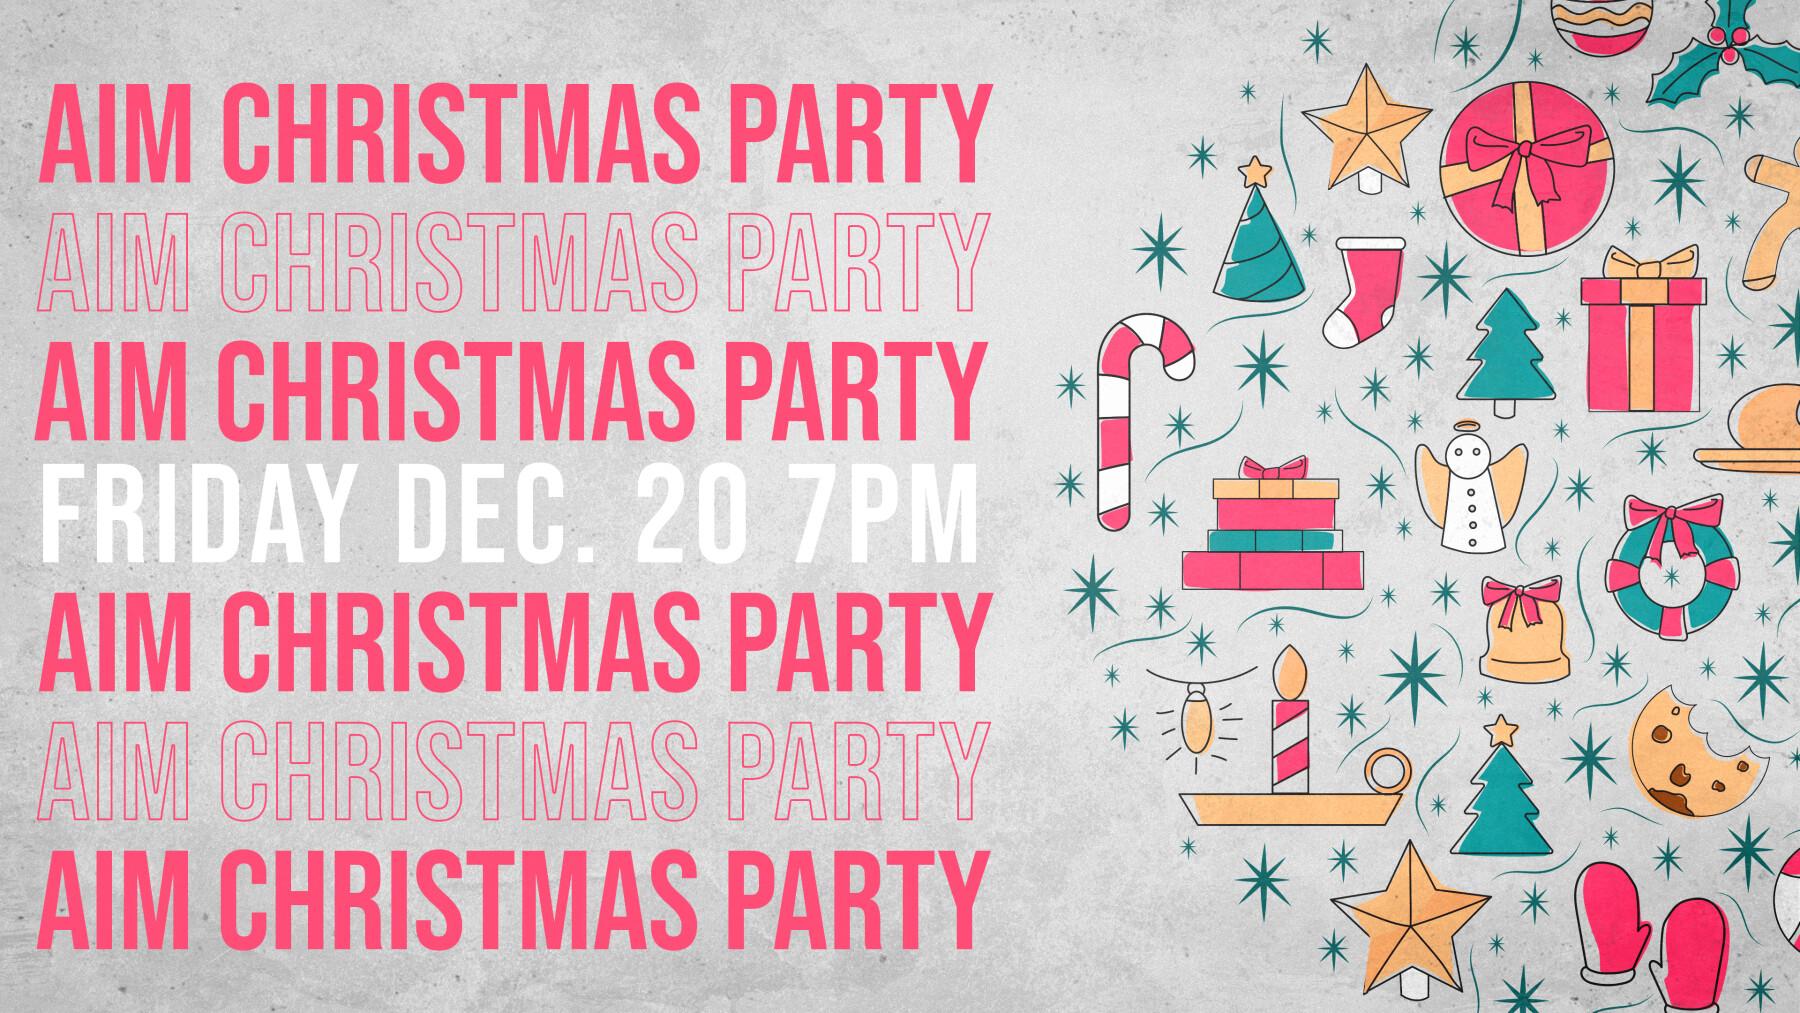 AIM CHRISTMAS PARTY